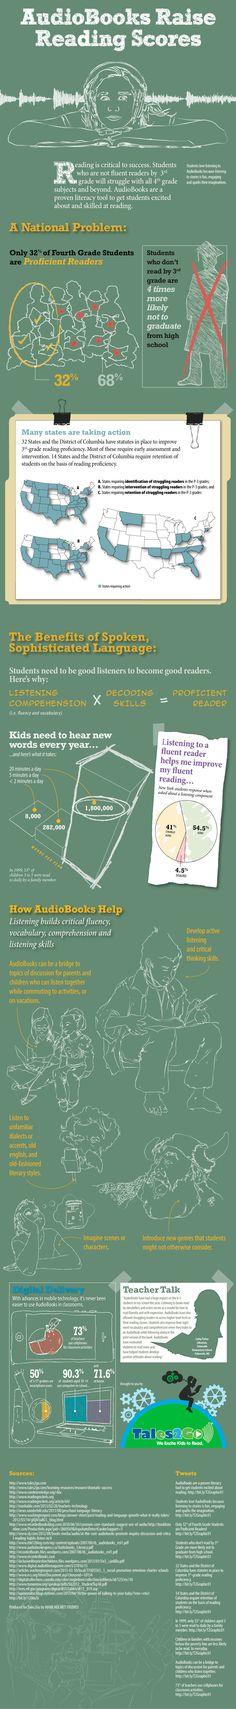 Do audio books raise reading scores? YES! {click to enlarge image} Interesting concept!